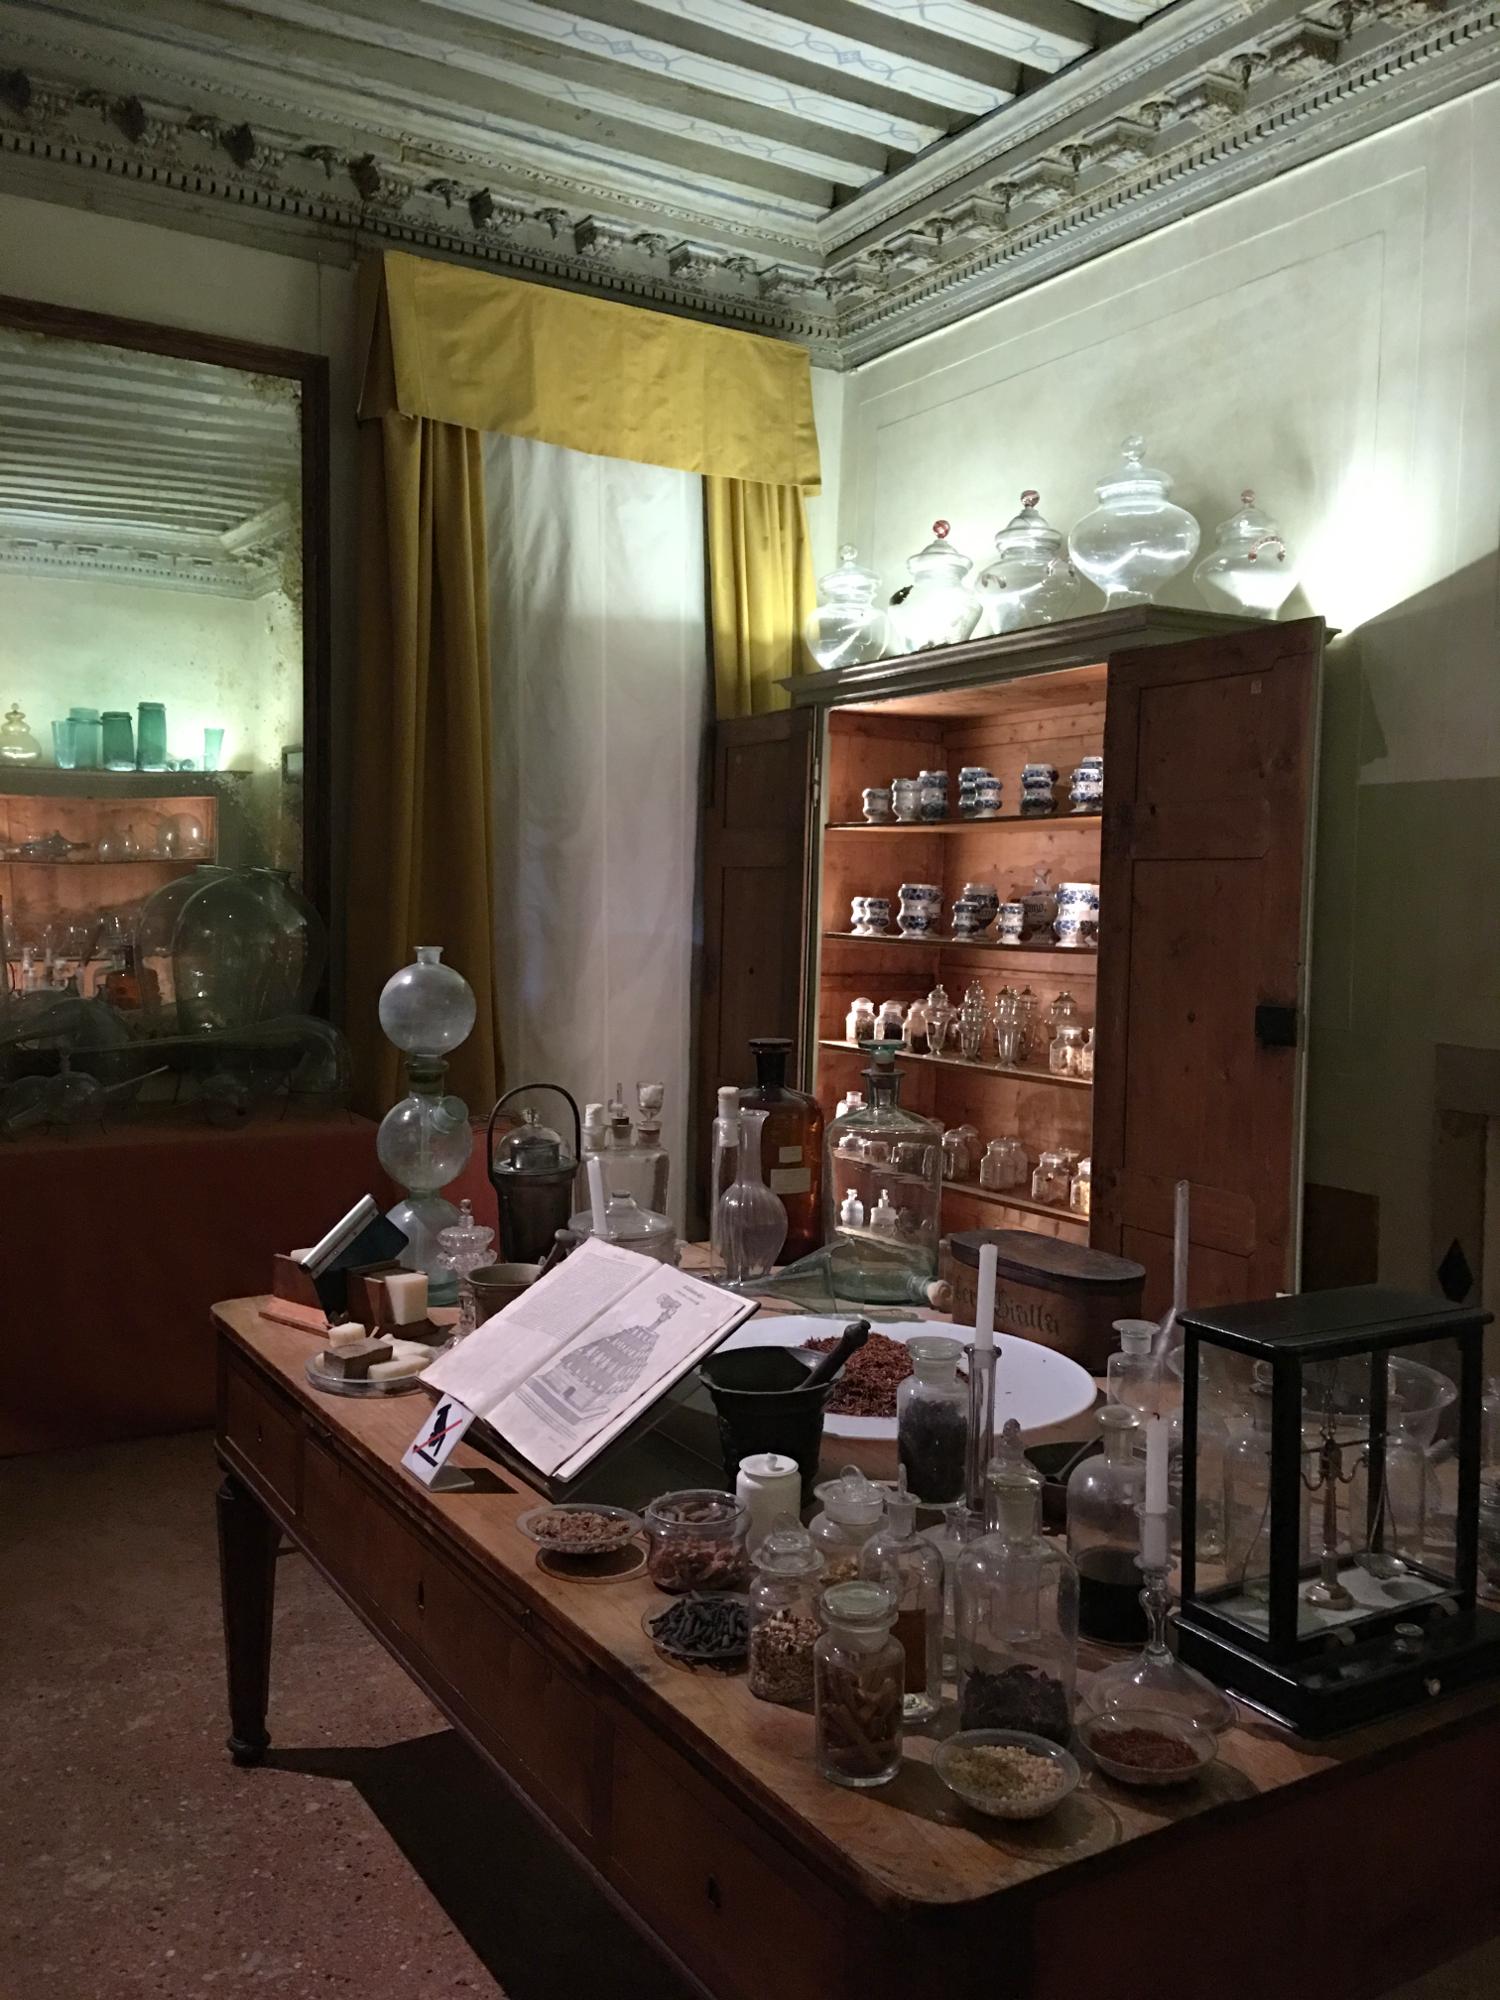 rocaille-blog-venezia-palazzo-mocenigo-percorso-profumo-mavive-vidal-49